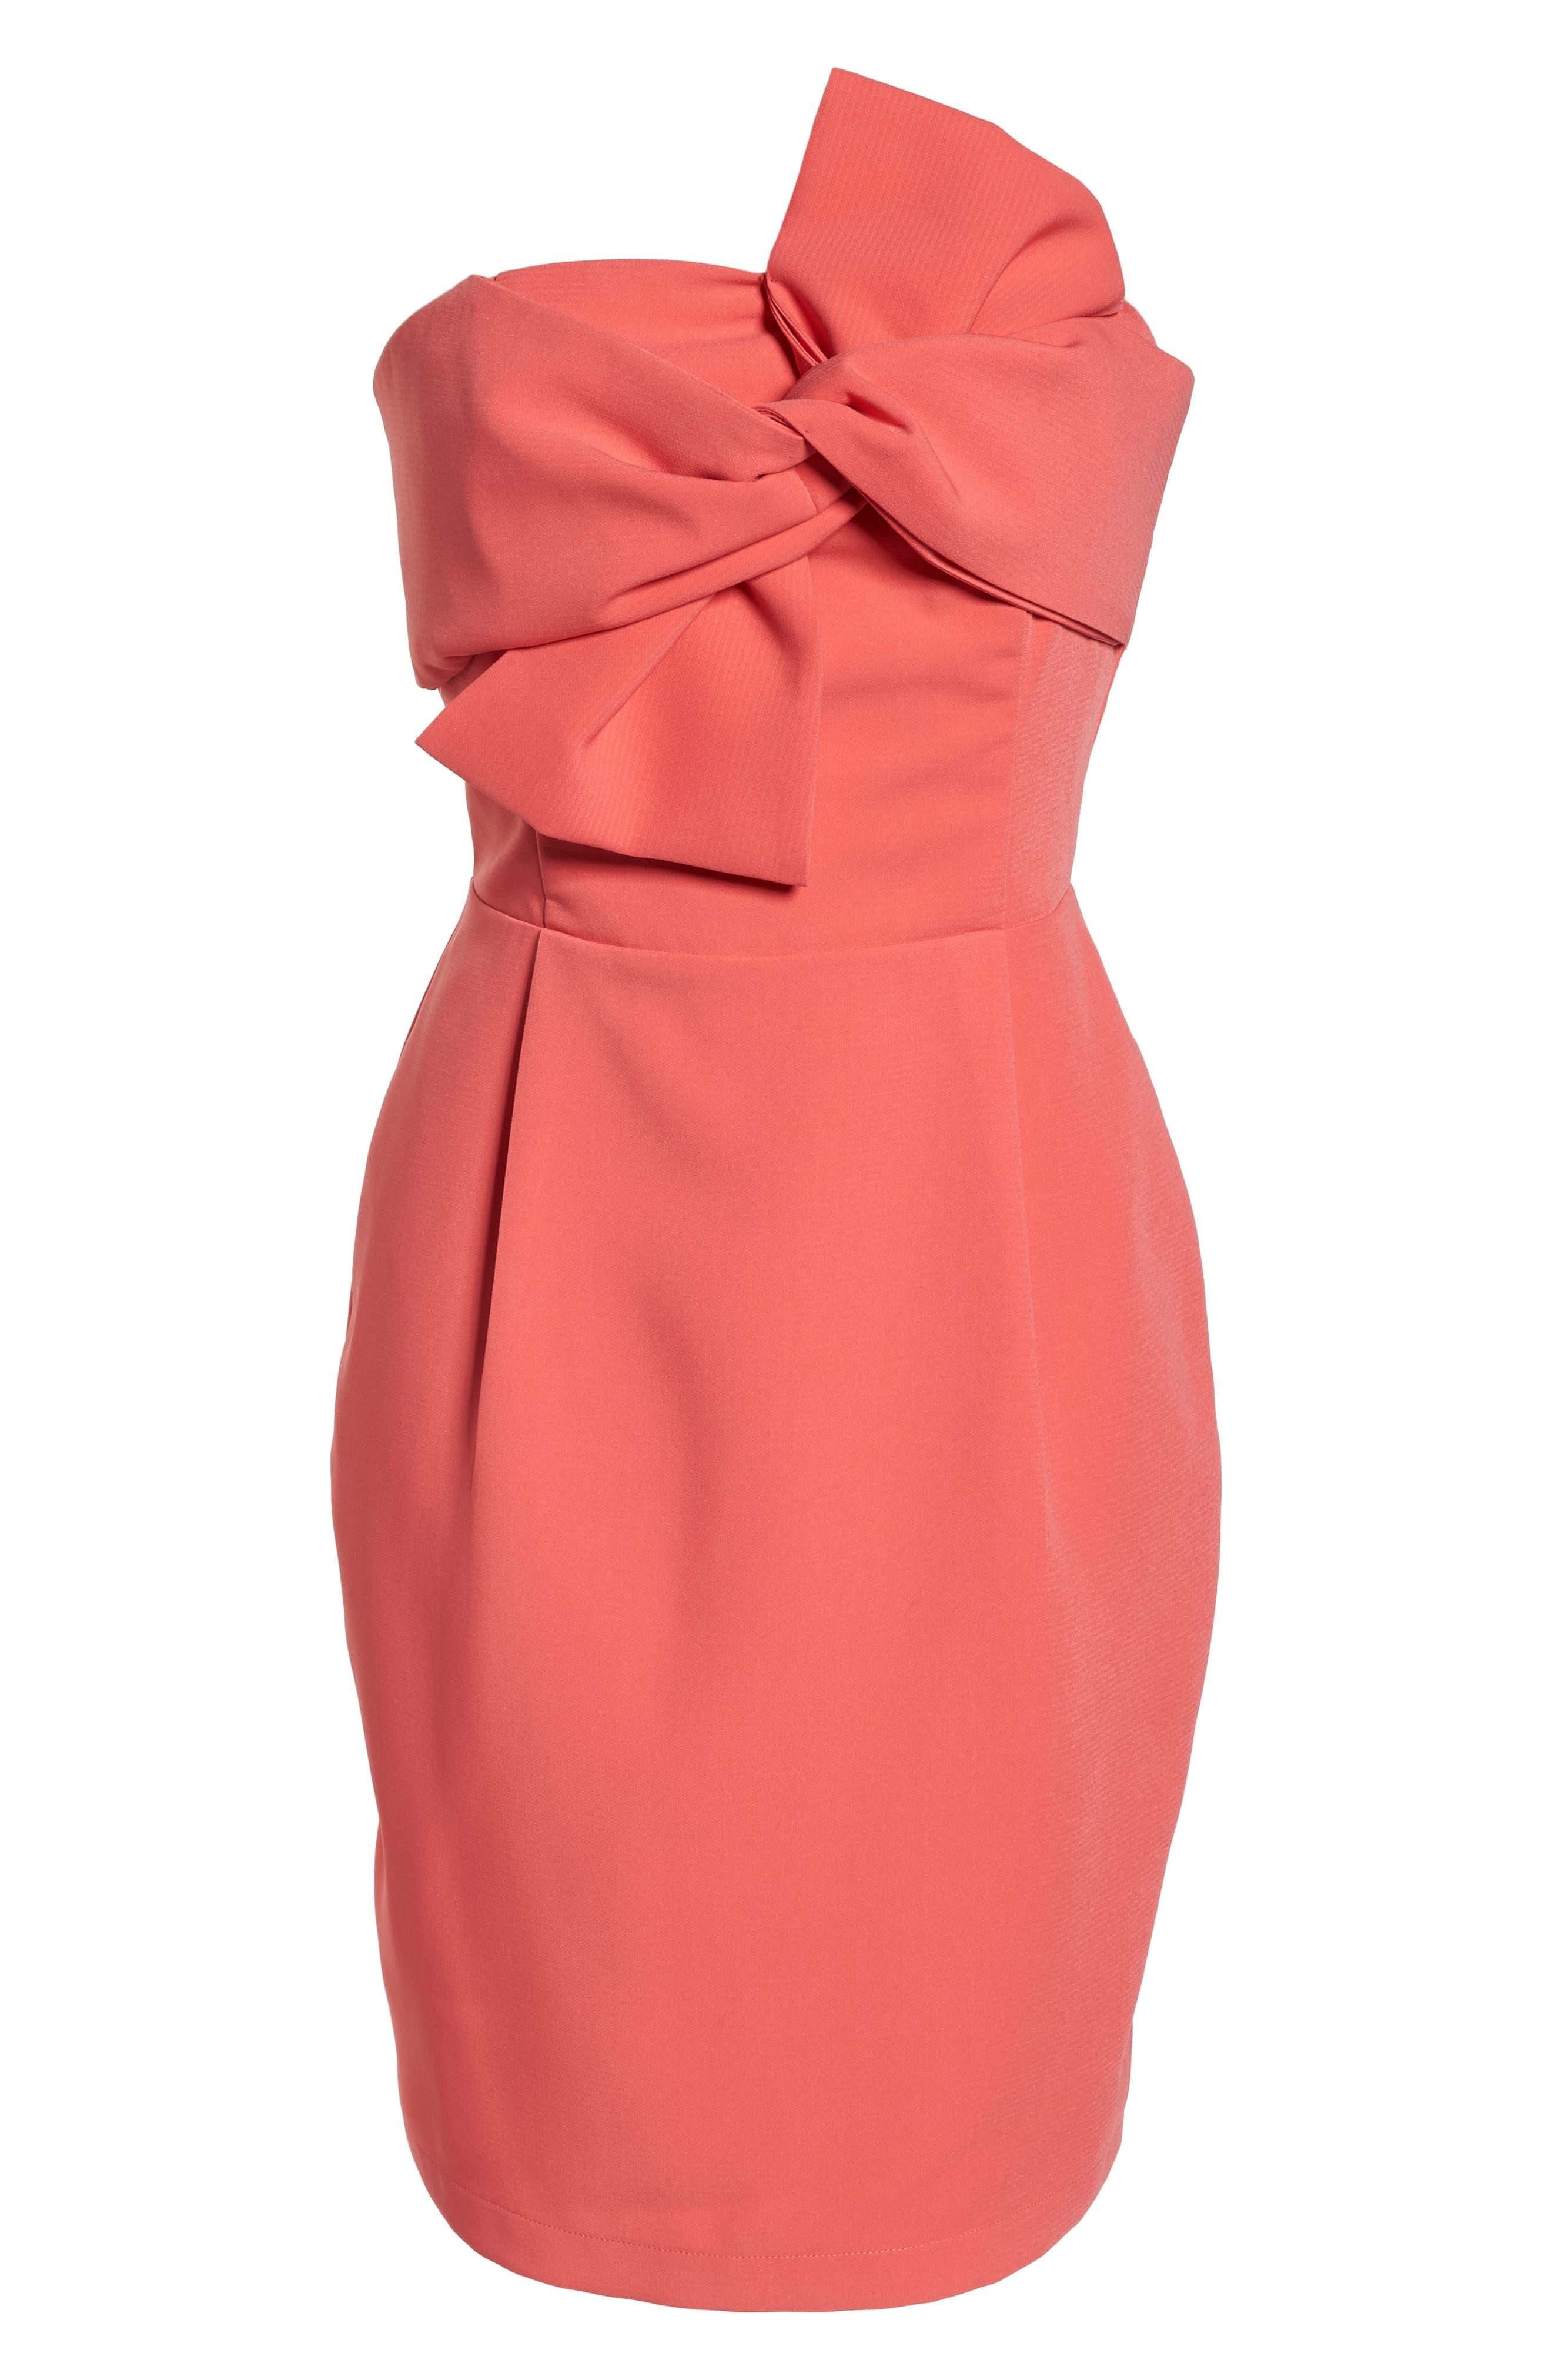 Harper Knotted Strapless Minidress,                             Alternate thumbnail 7, color,                             Coral